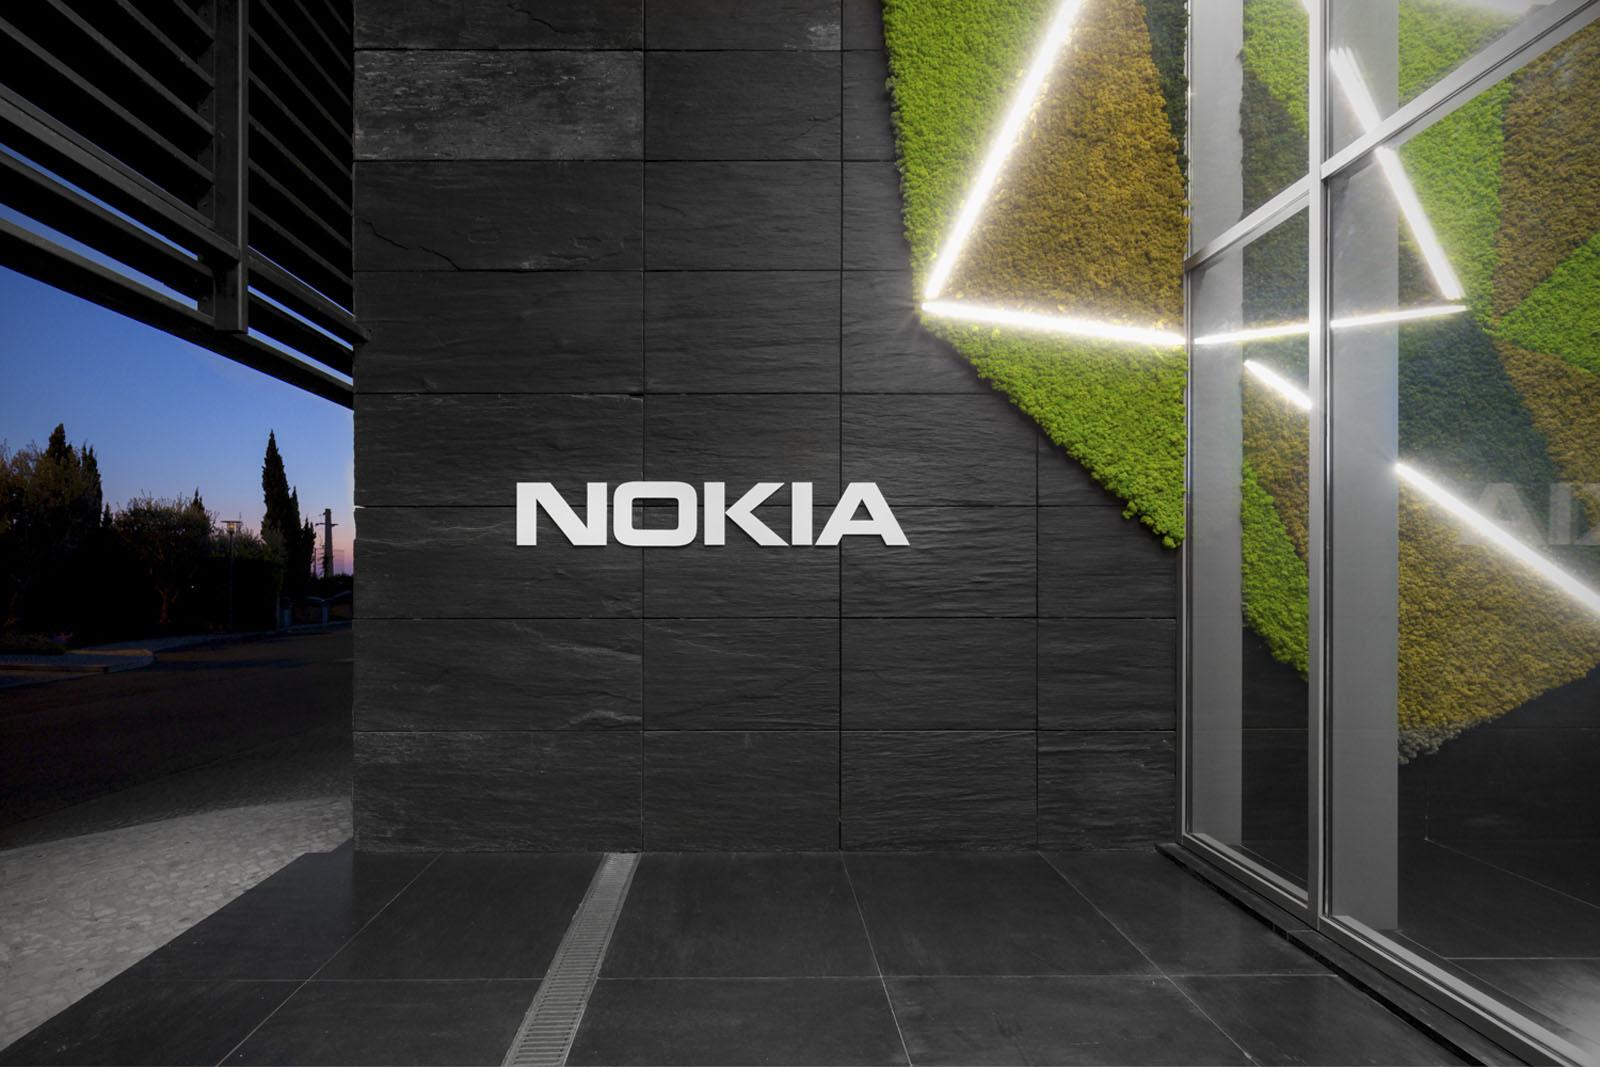 Nokia_20171111_0160_copy_LR.jpg